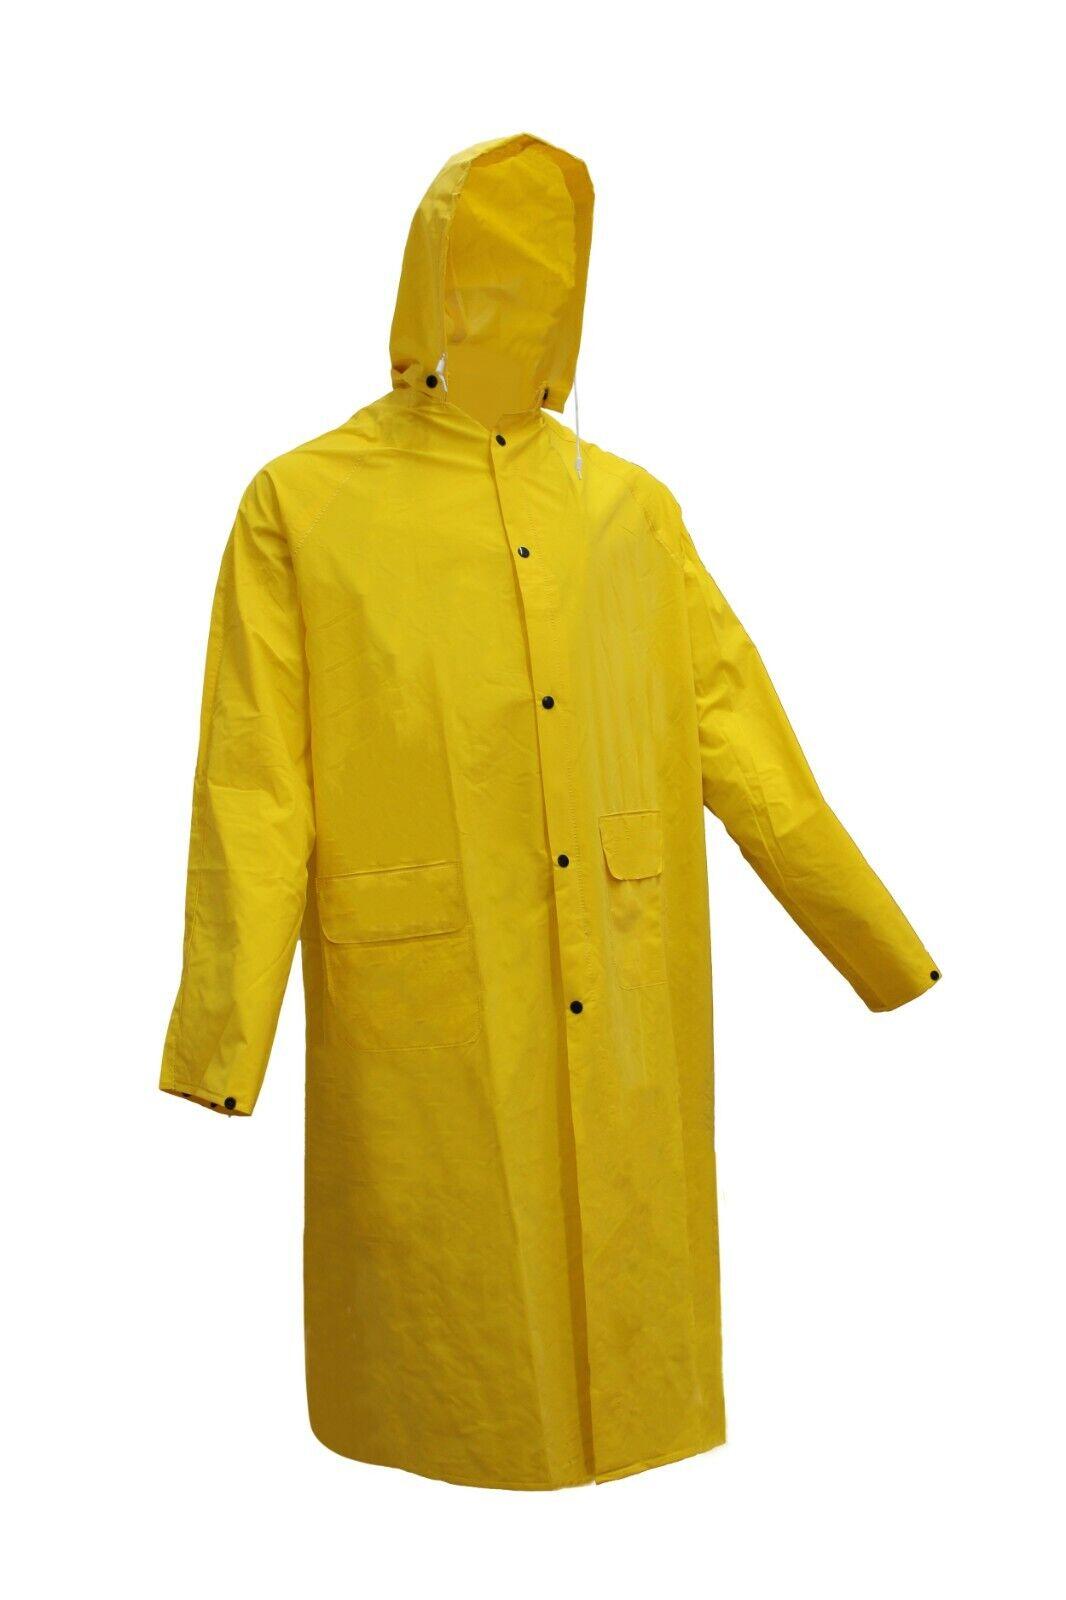 RK Safety RK-RC500 Rainwear Polyester Trench Rain Long Coat